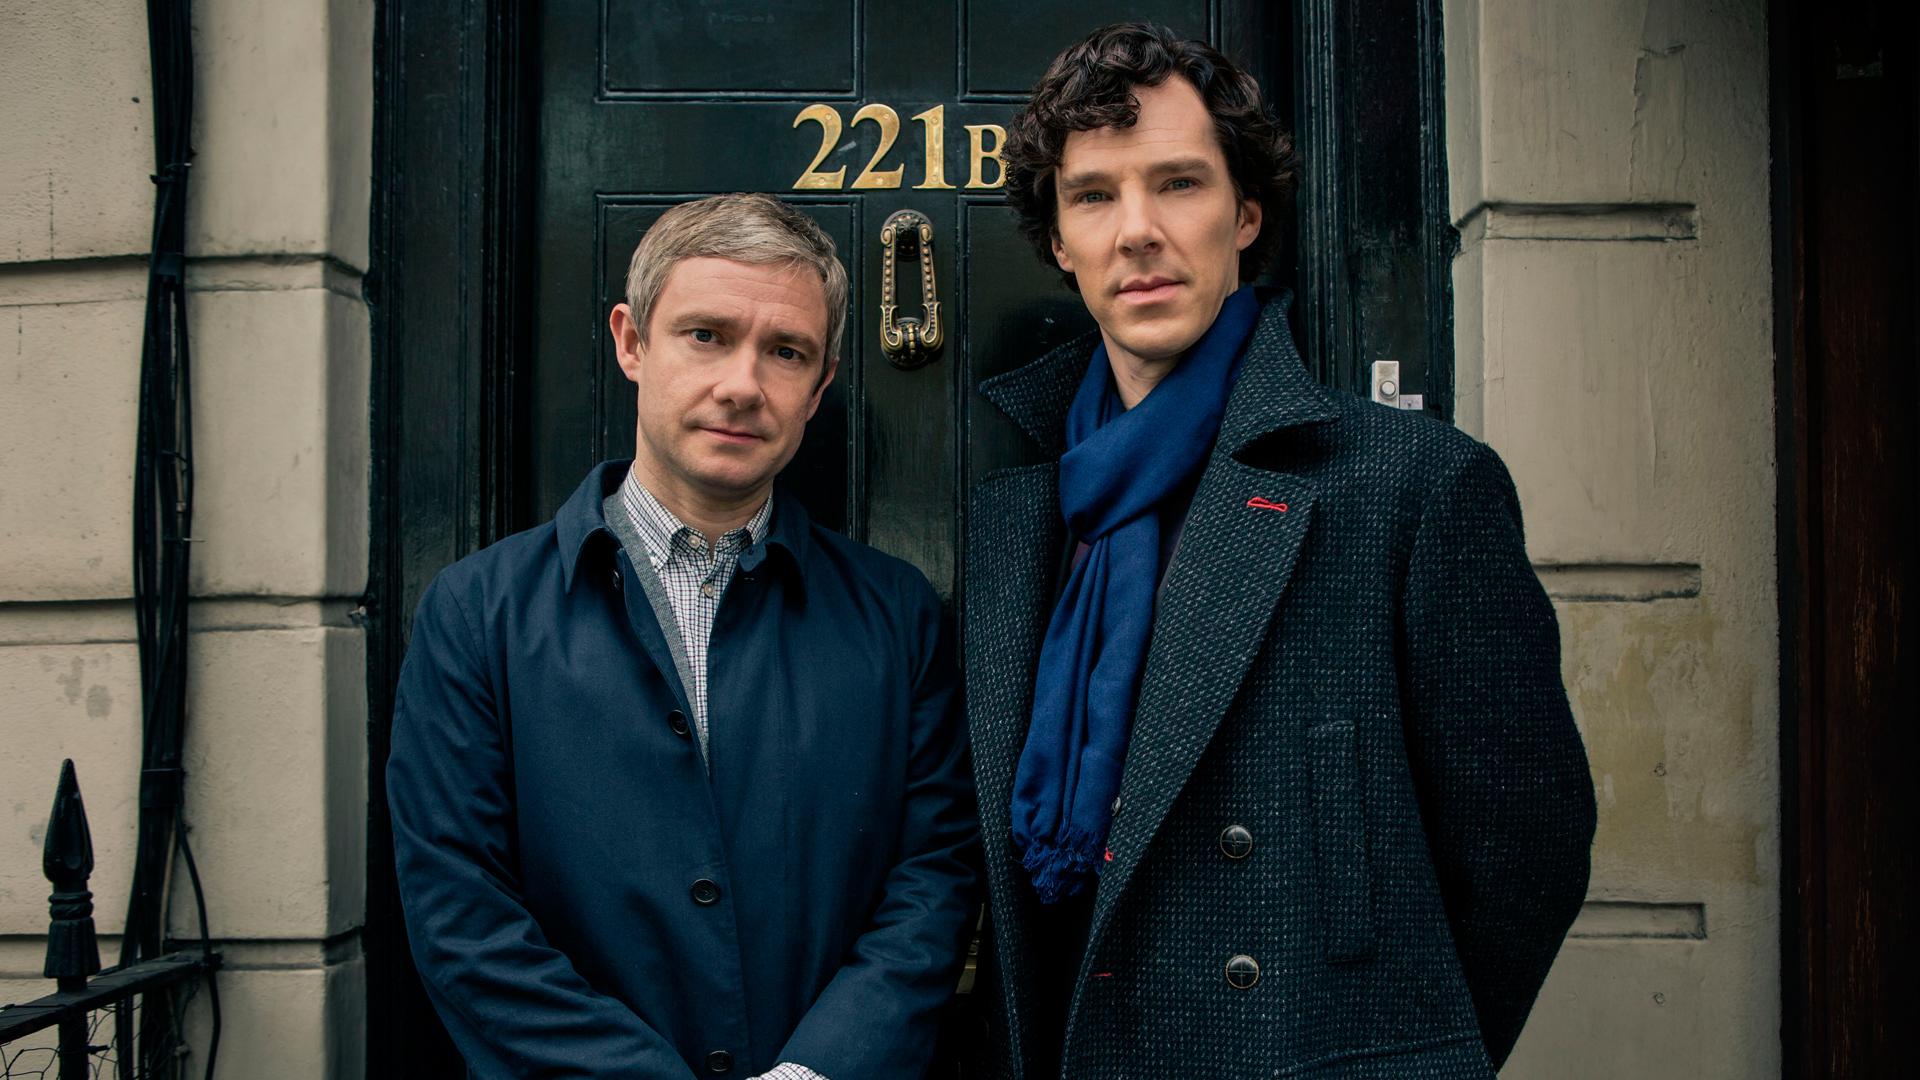 Sherlock's co-creator Mark Gatiss hints series 5 could never happen